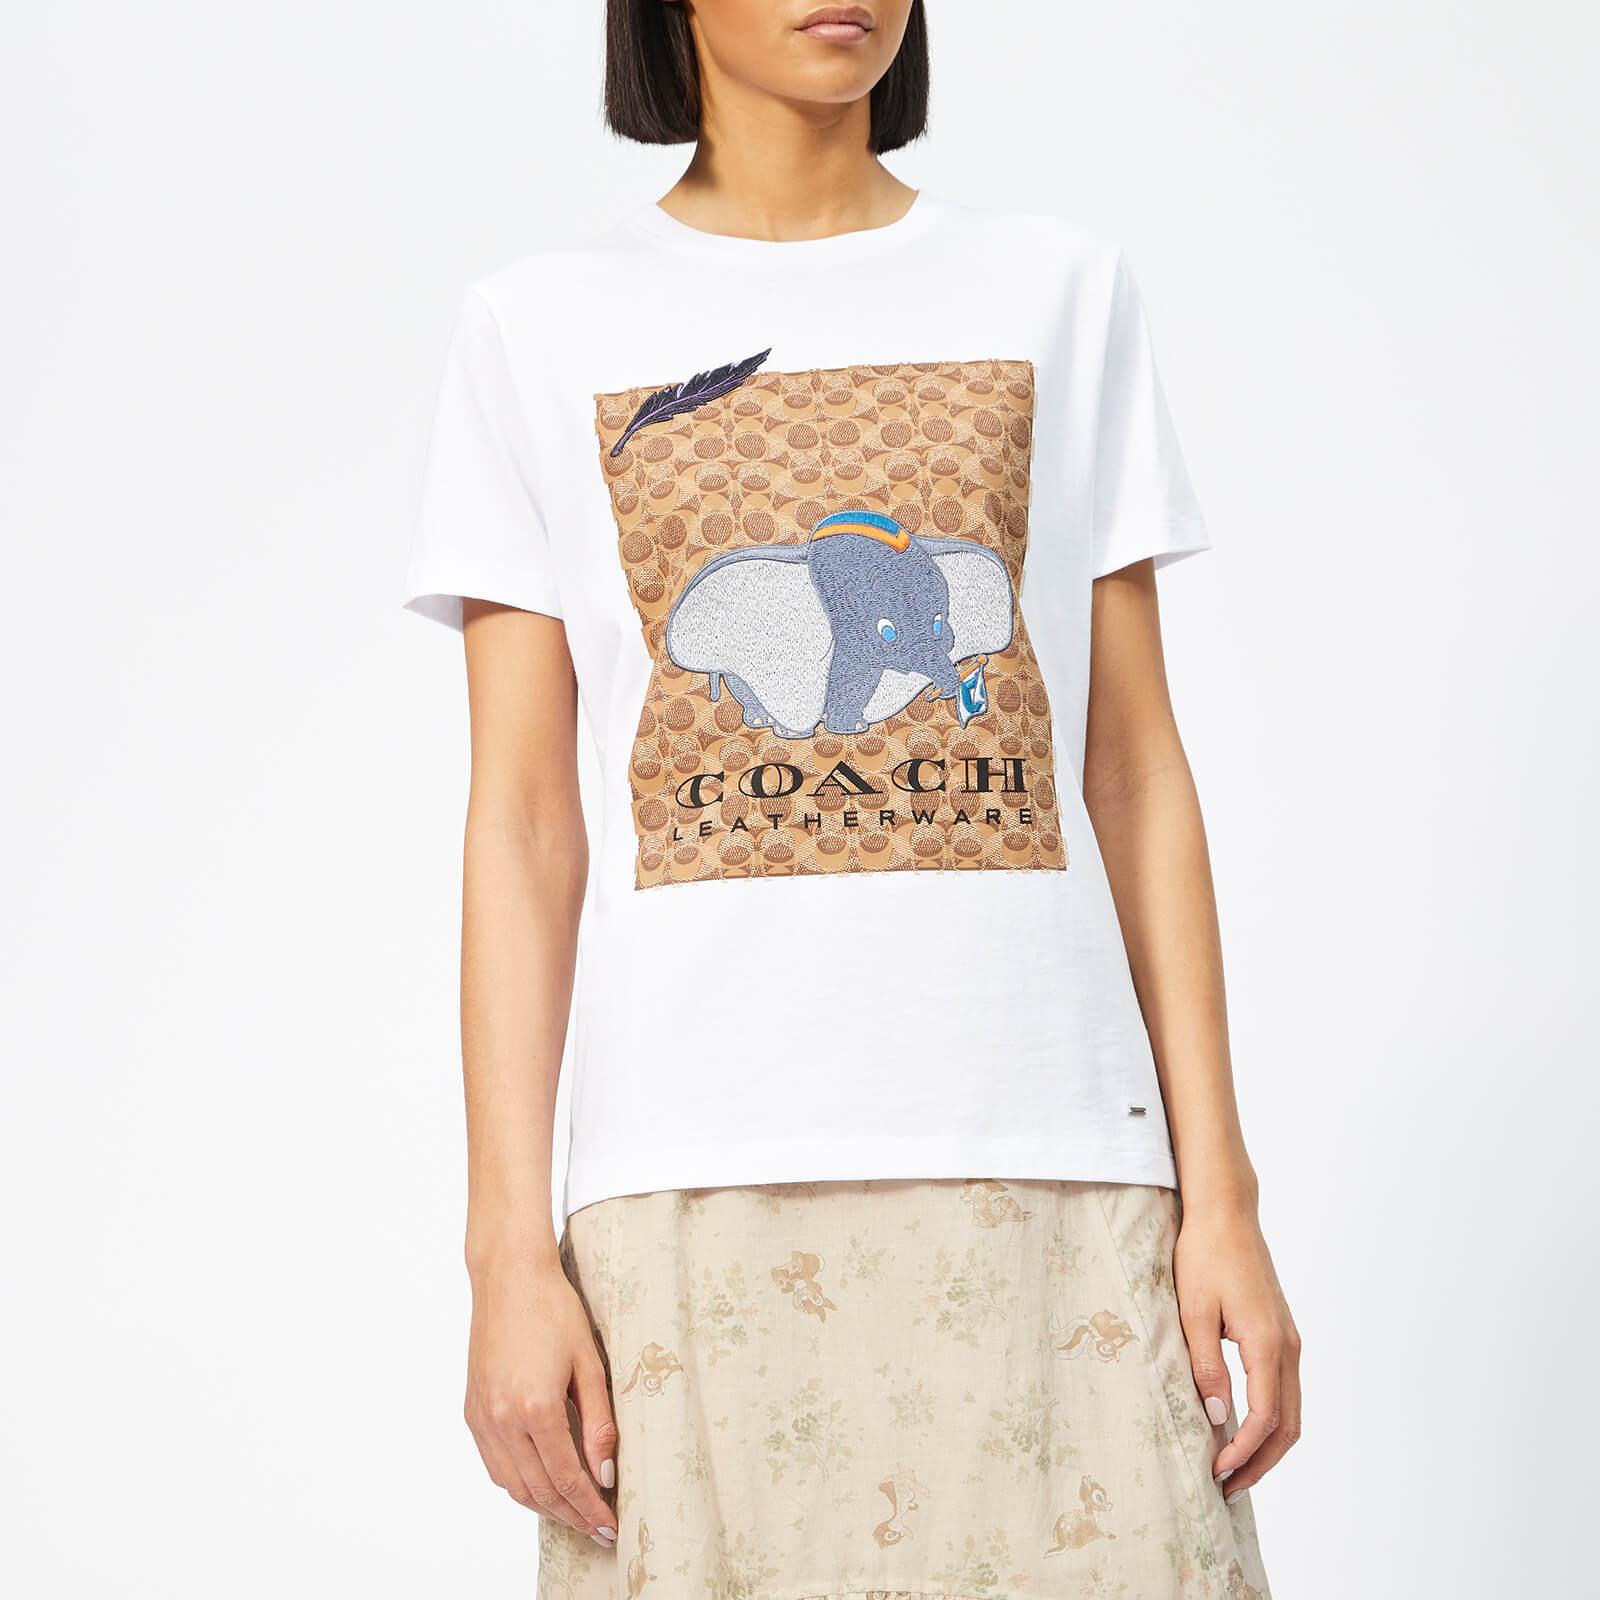 7e20a6ff7e3ed Coach 1941 Women's X Disney Dumbo Signature T-Shirt - Optic White - Free UK  Delivery over £50